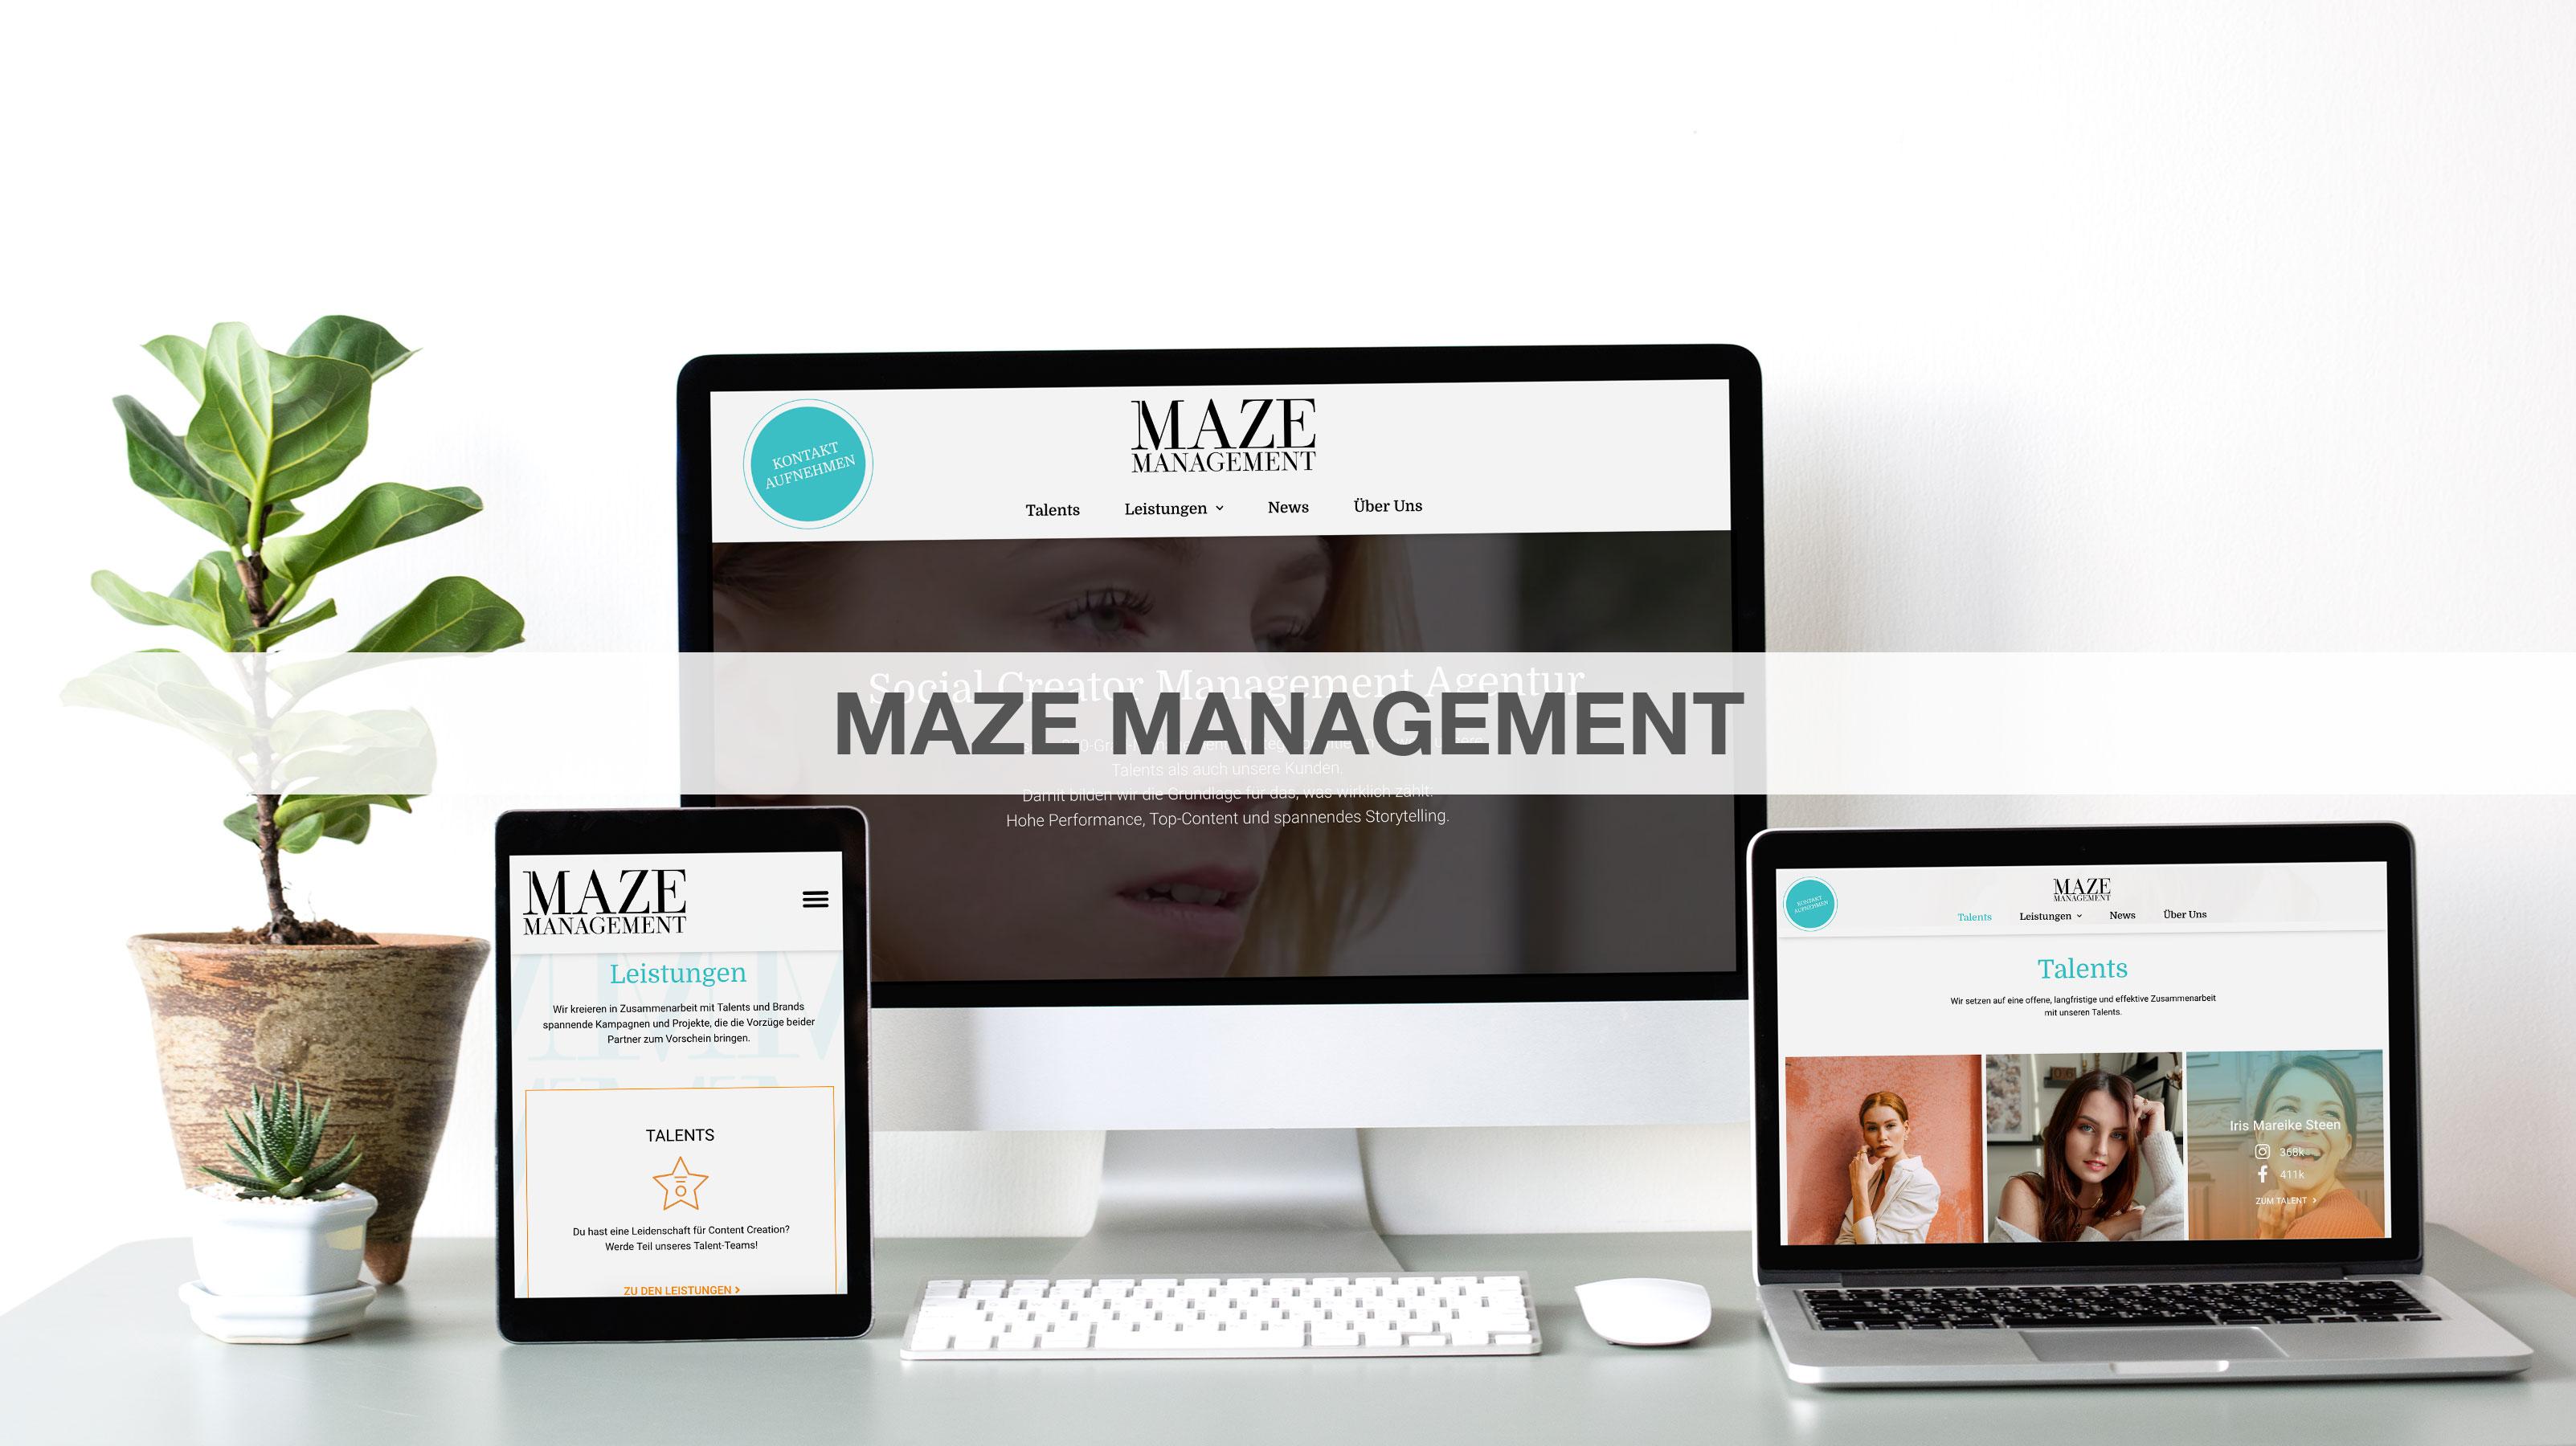 Maze Management - Markenbildung & Positionierung